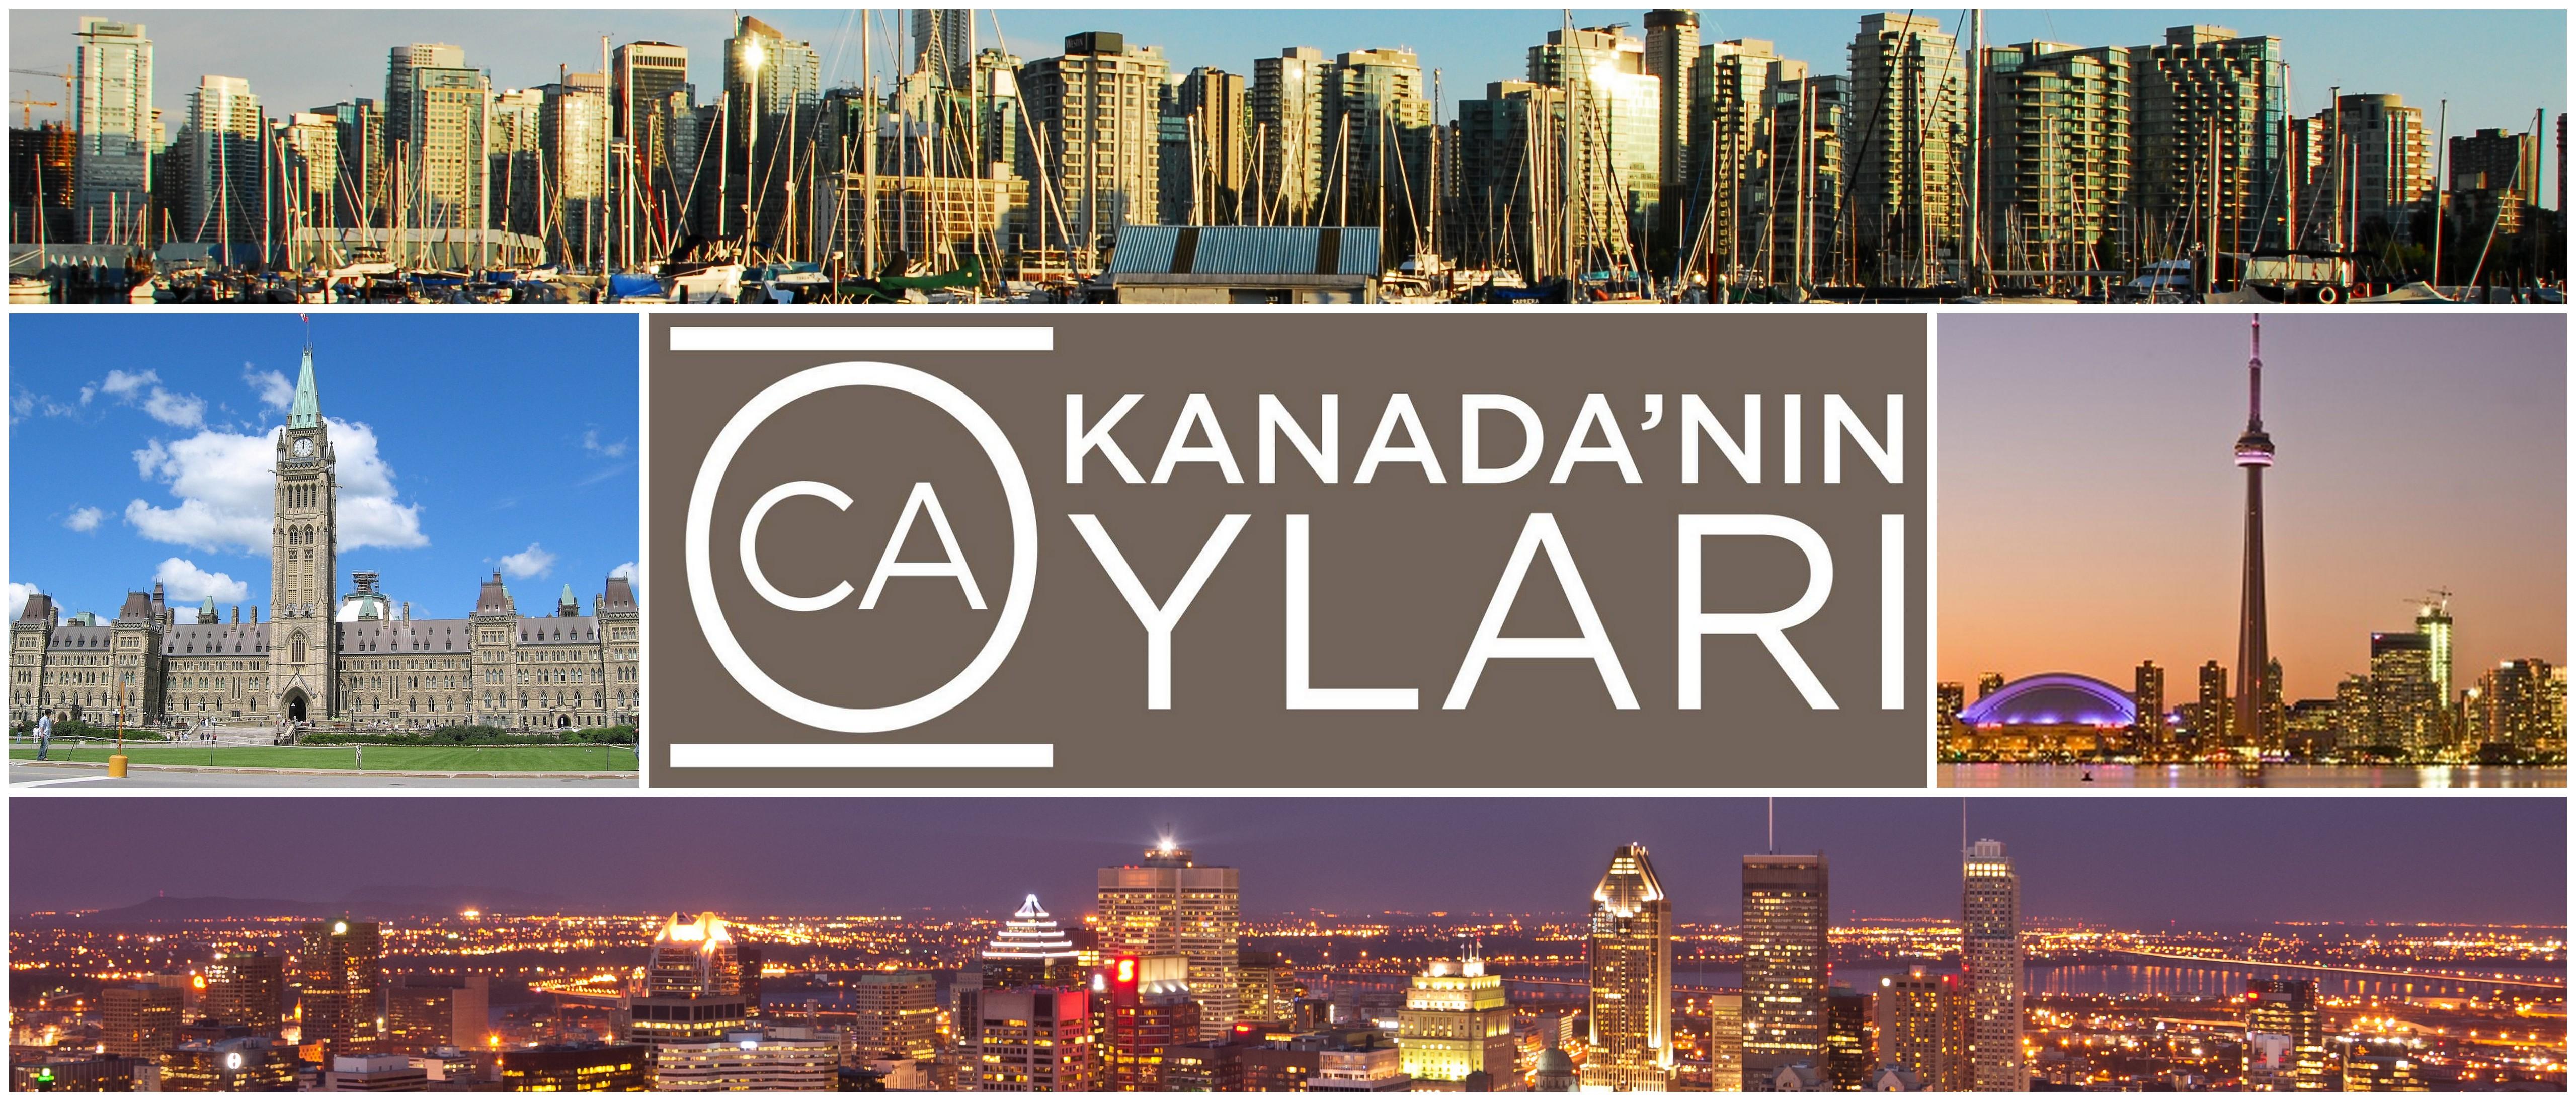 Kanada-Cover